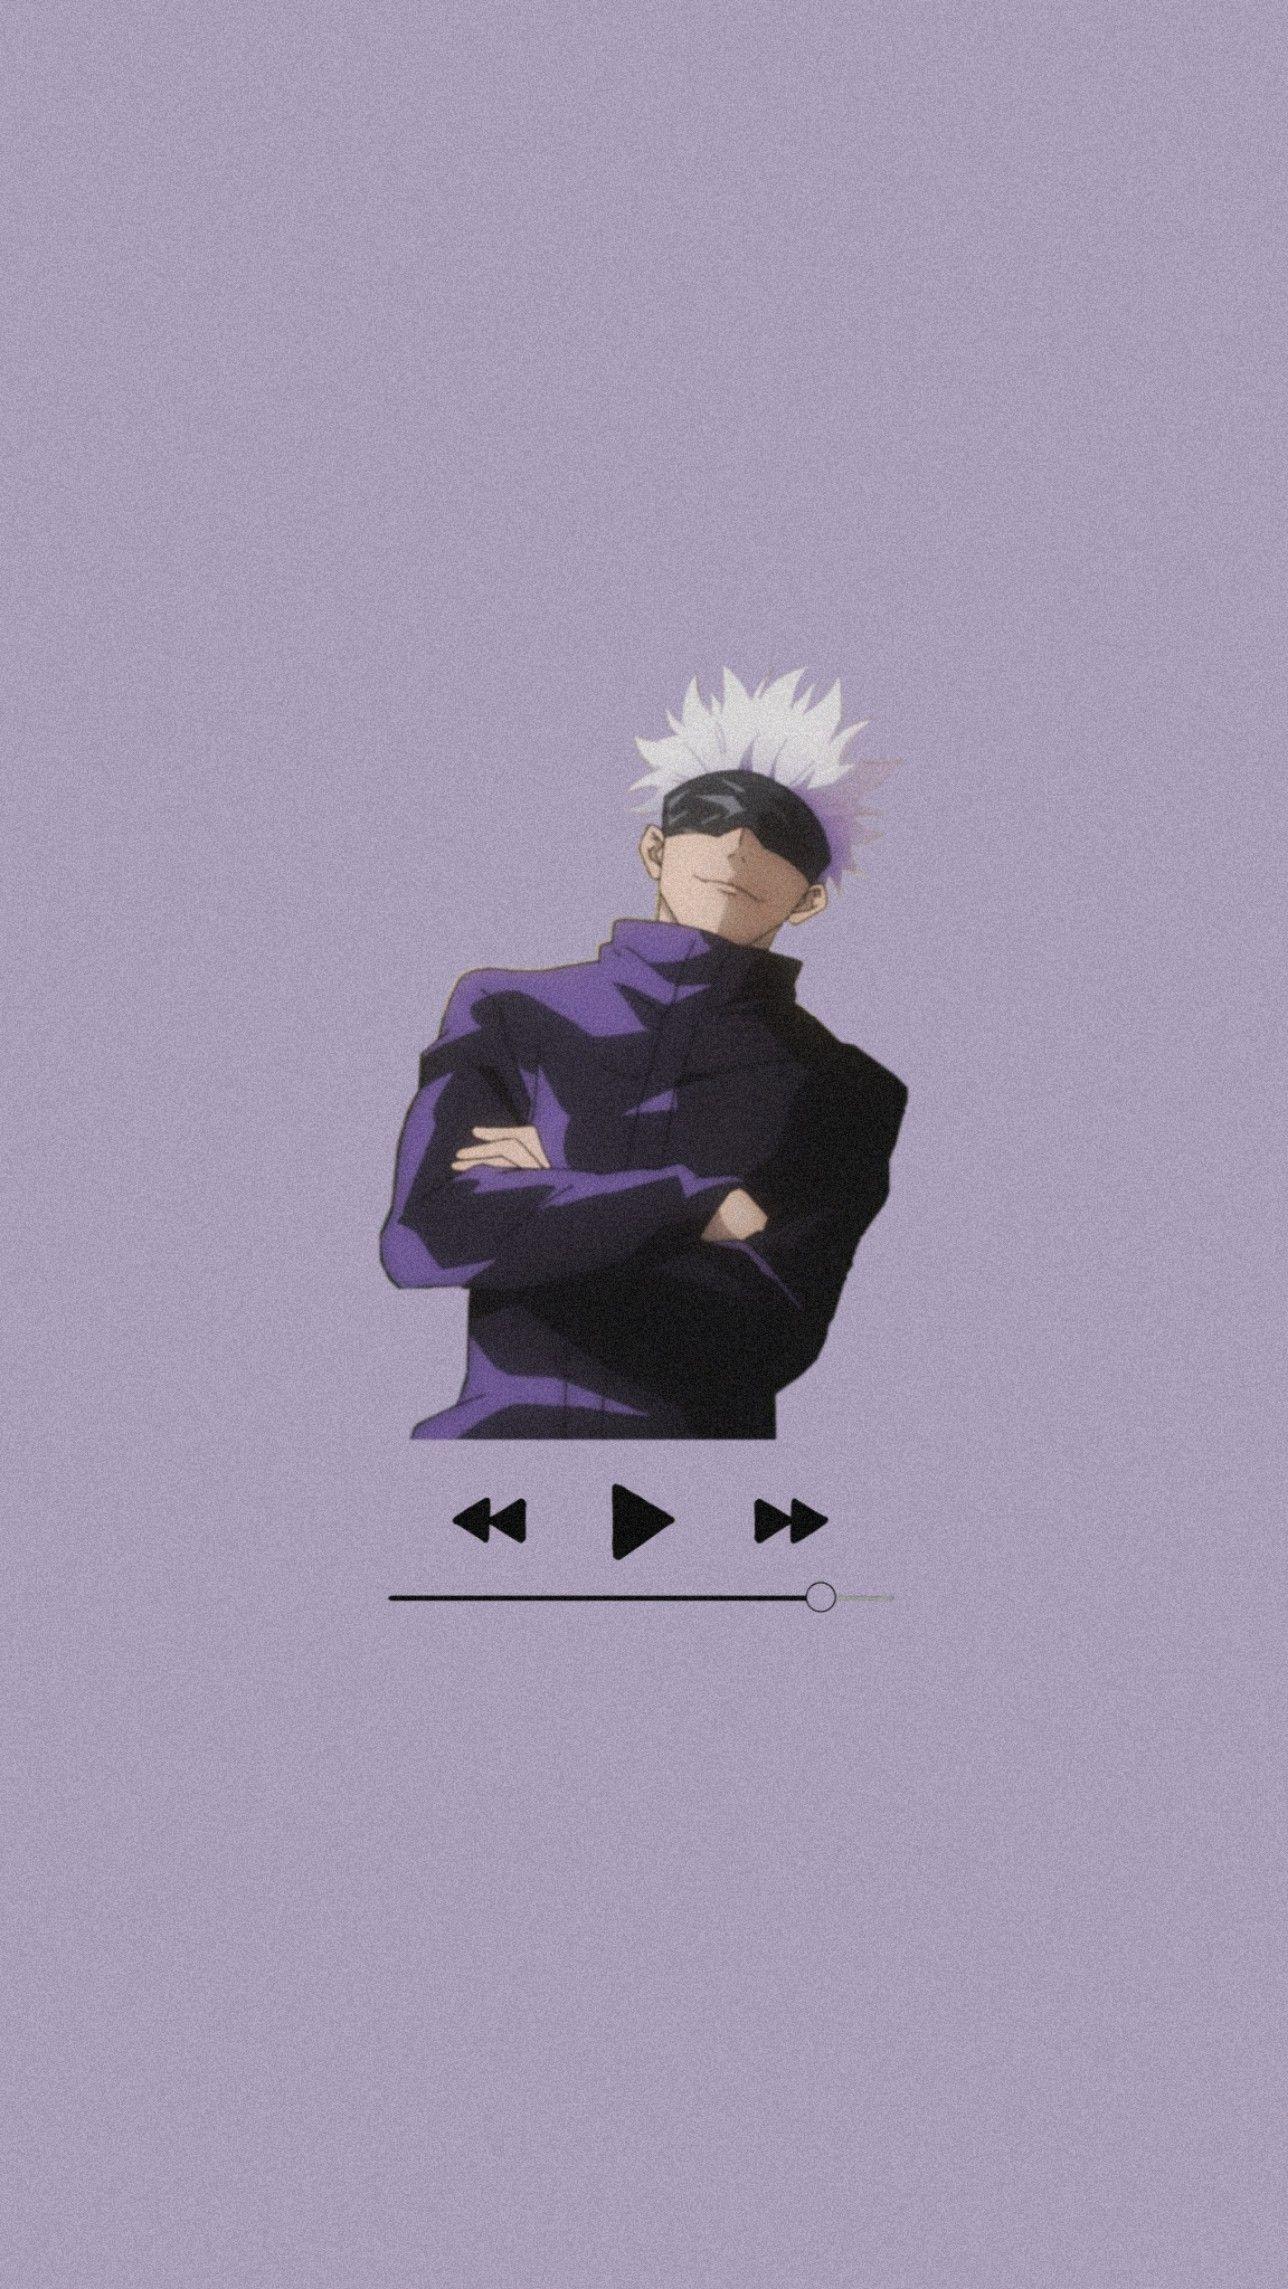 Music Satoru Gojo Wallpaper In 2021 Jujutsu Anime Wallpaper Anime Boyfriend